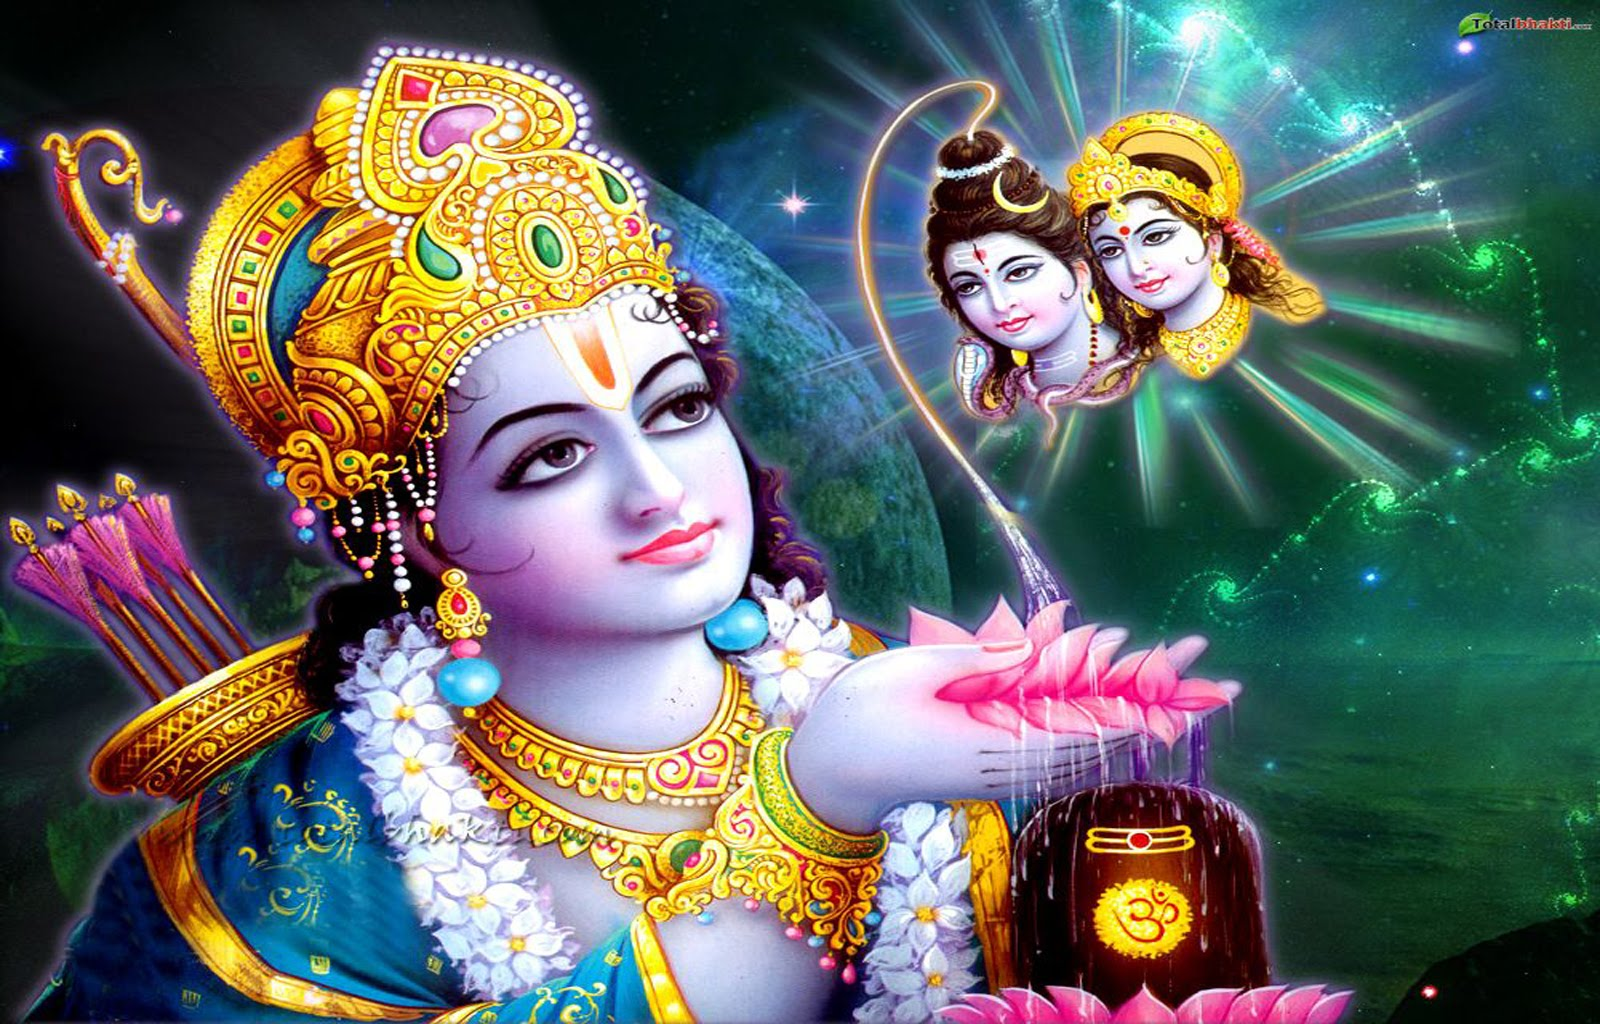 Wallpaper Gallery: Lord Shri Rama Wallpaper